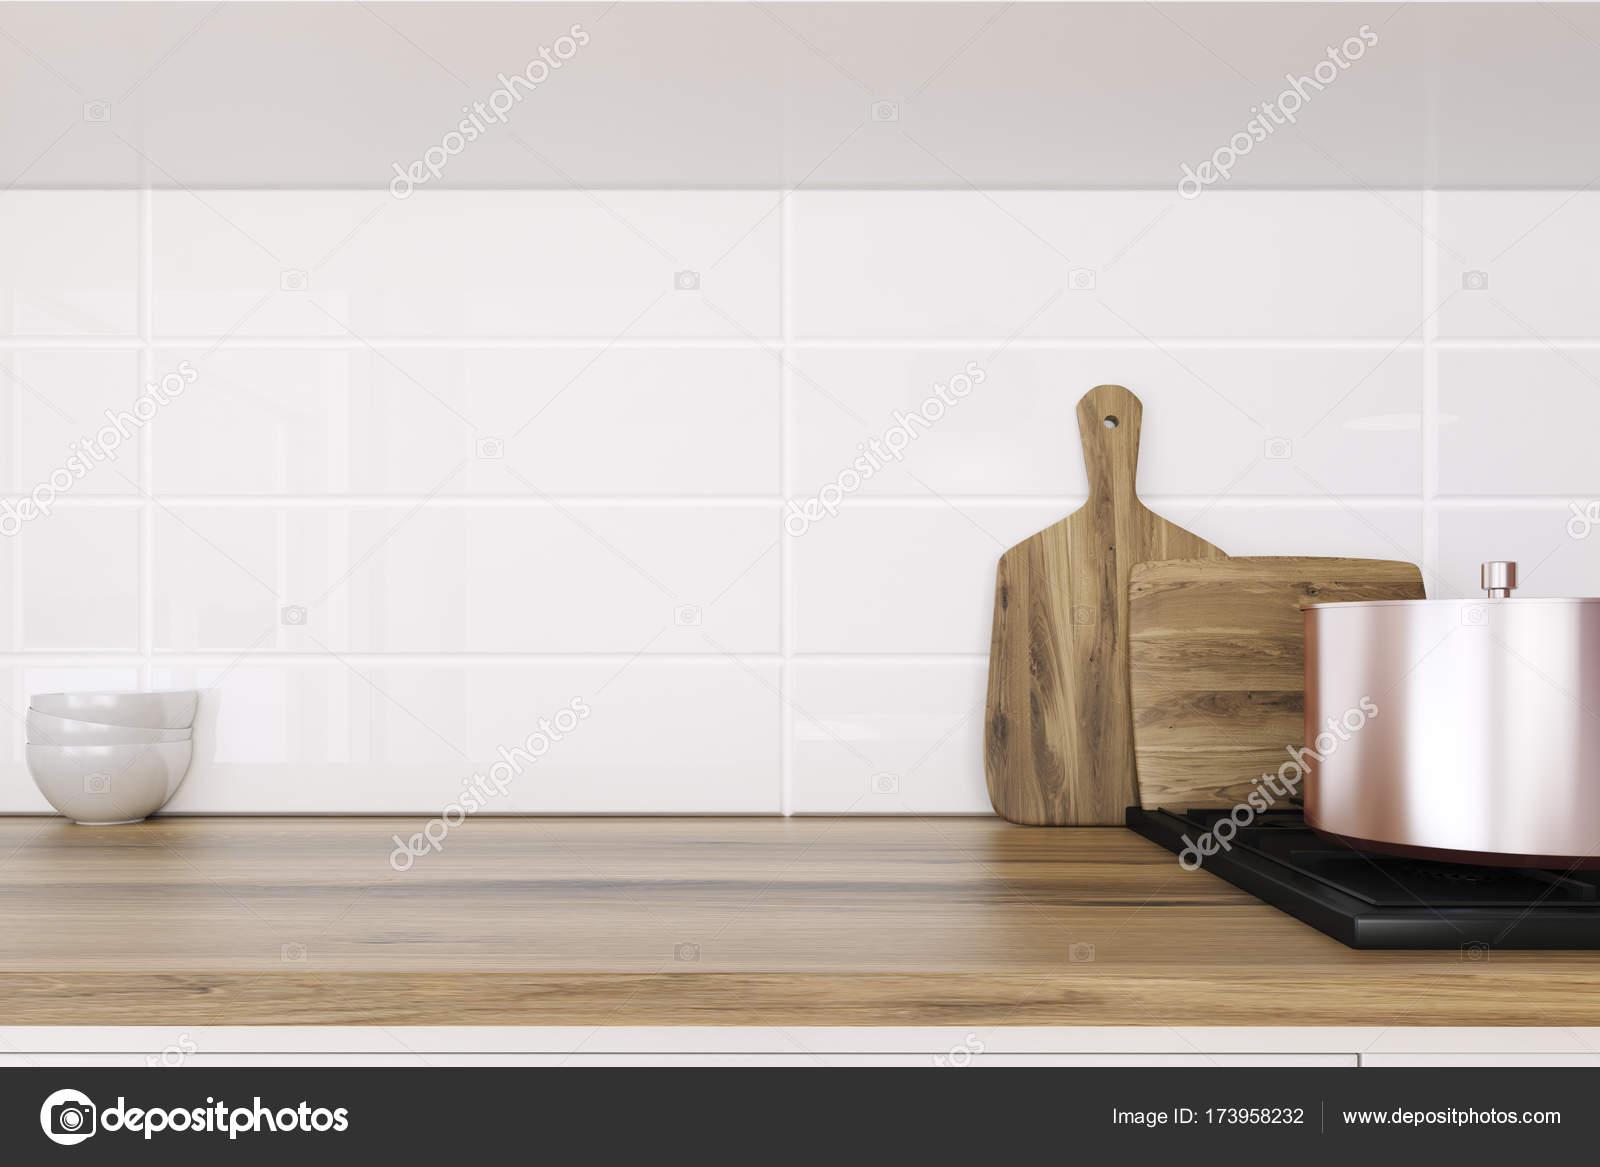 Encimera de cocina de madera de cerca — Foto de stock ...